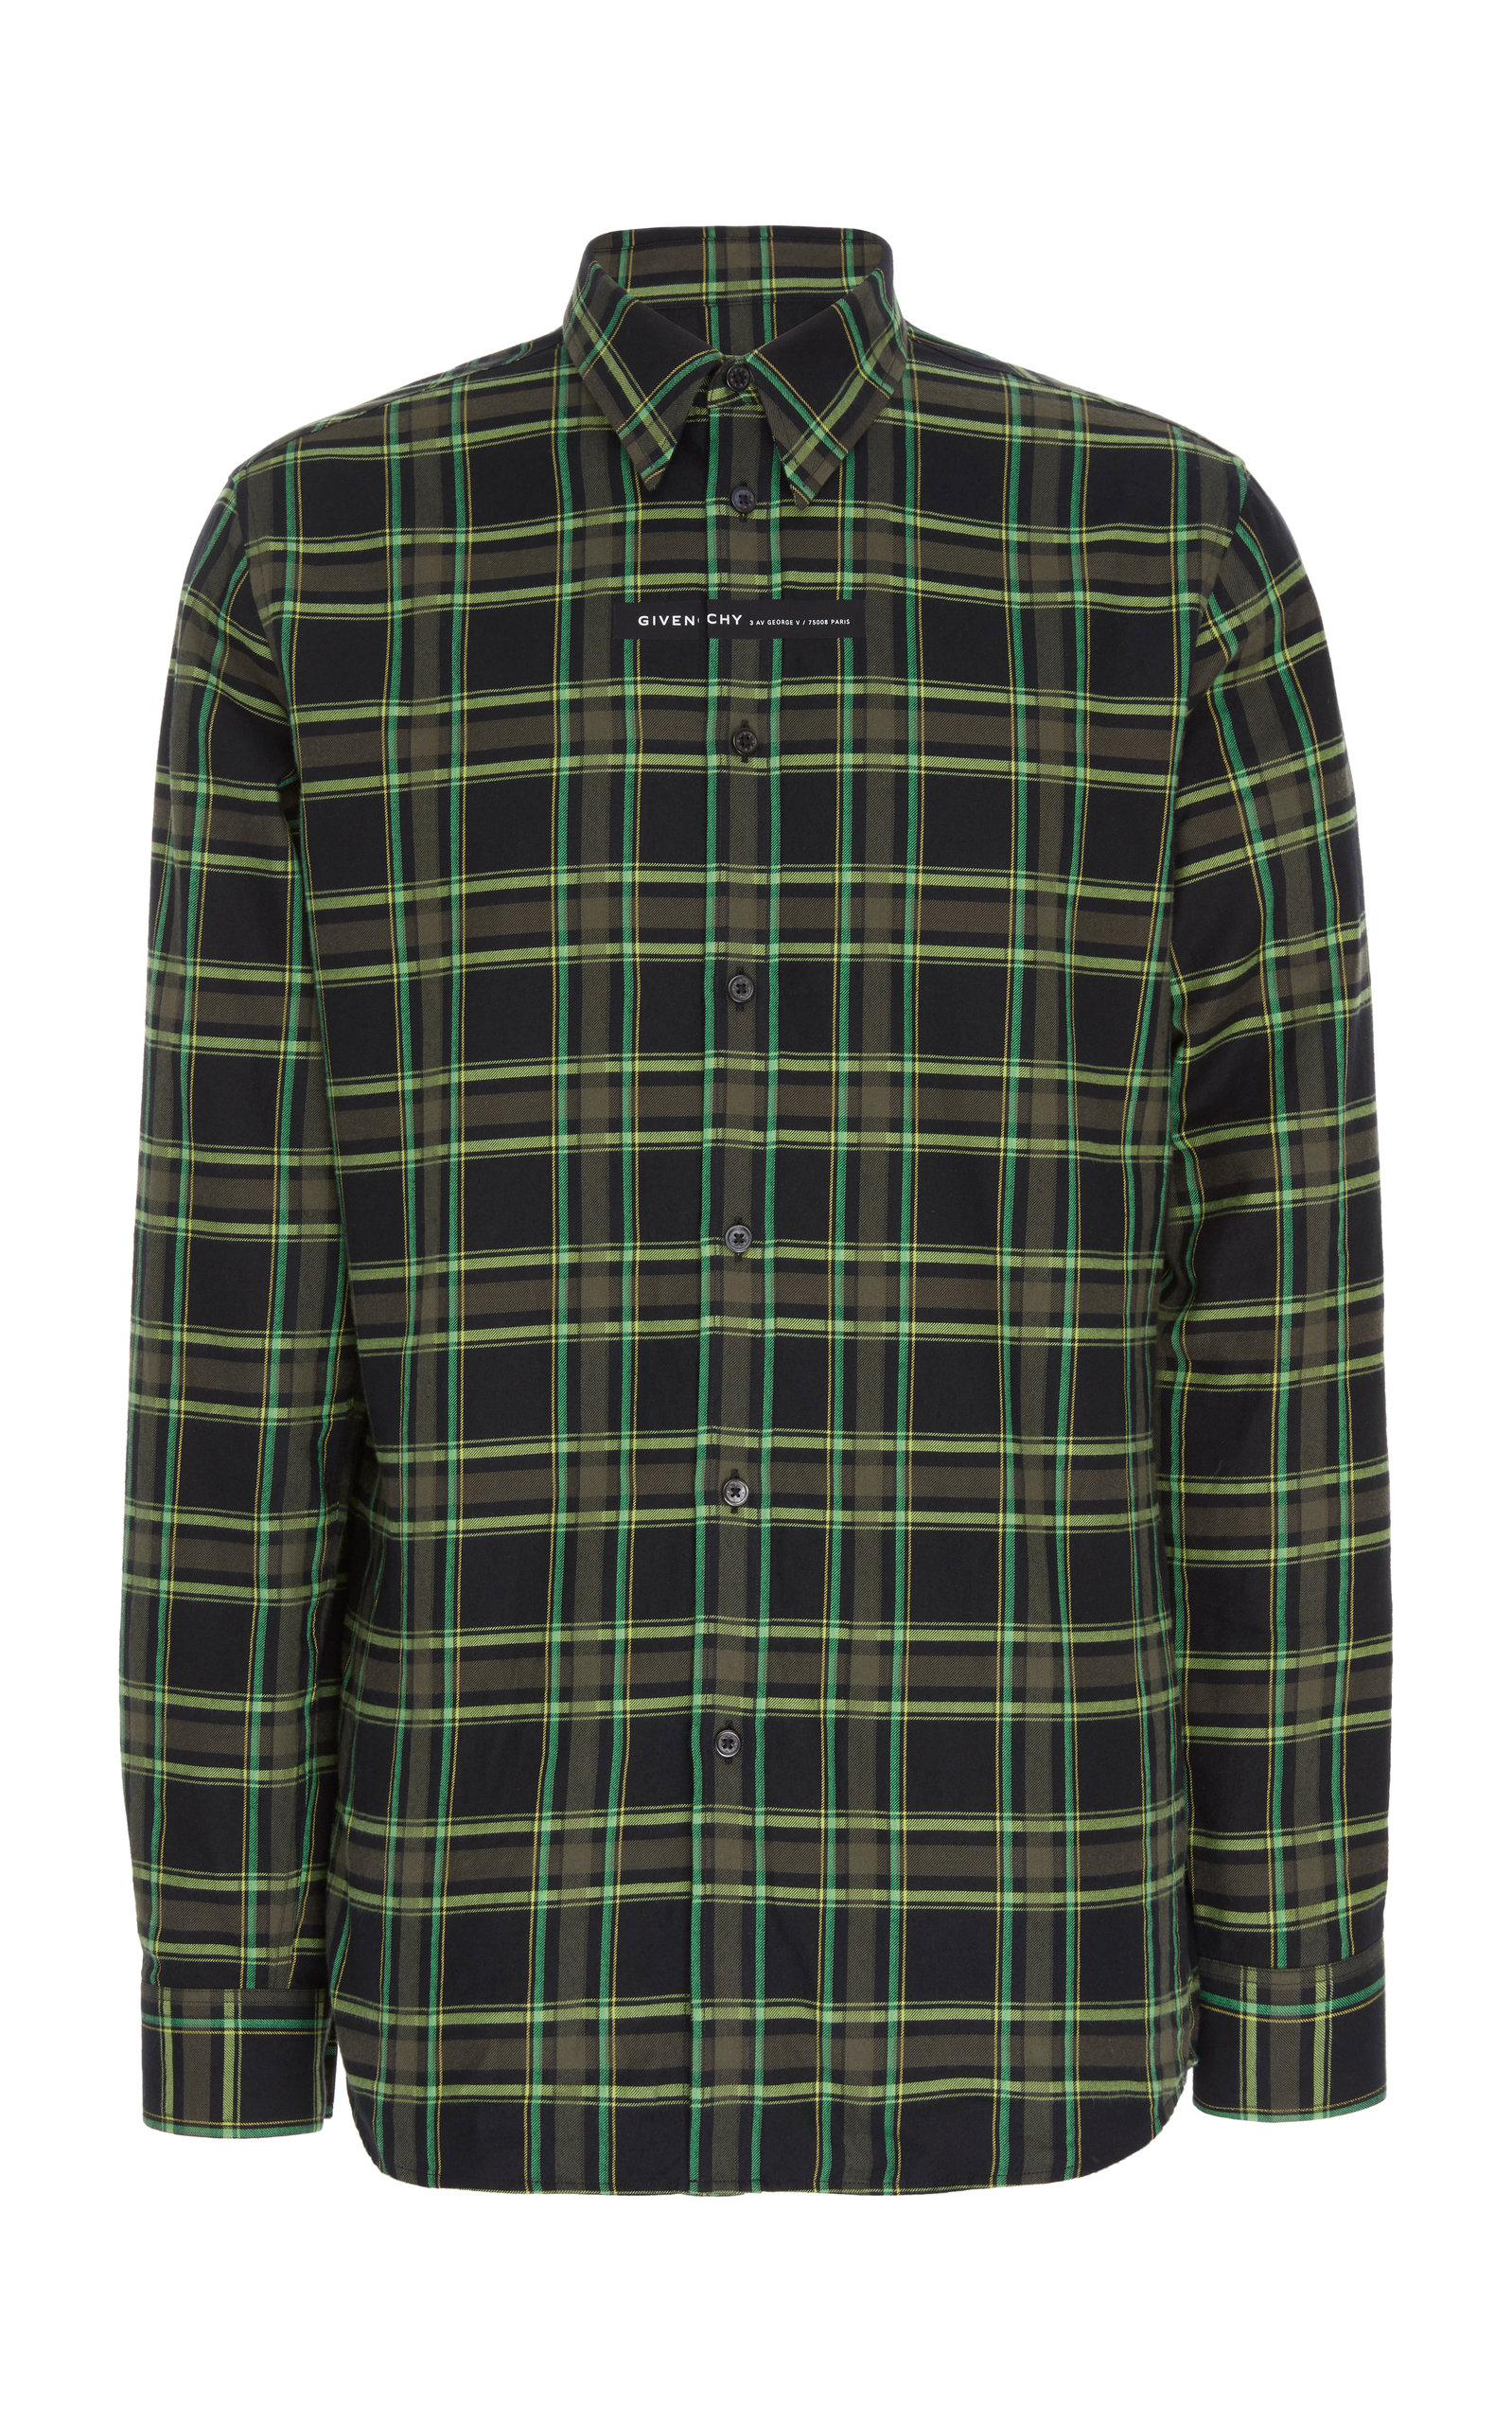 Givenchy T-shirts Logo-Patch Plaid Cotton Shirt